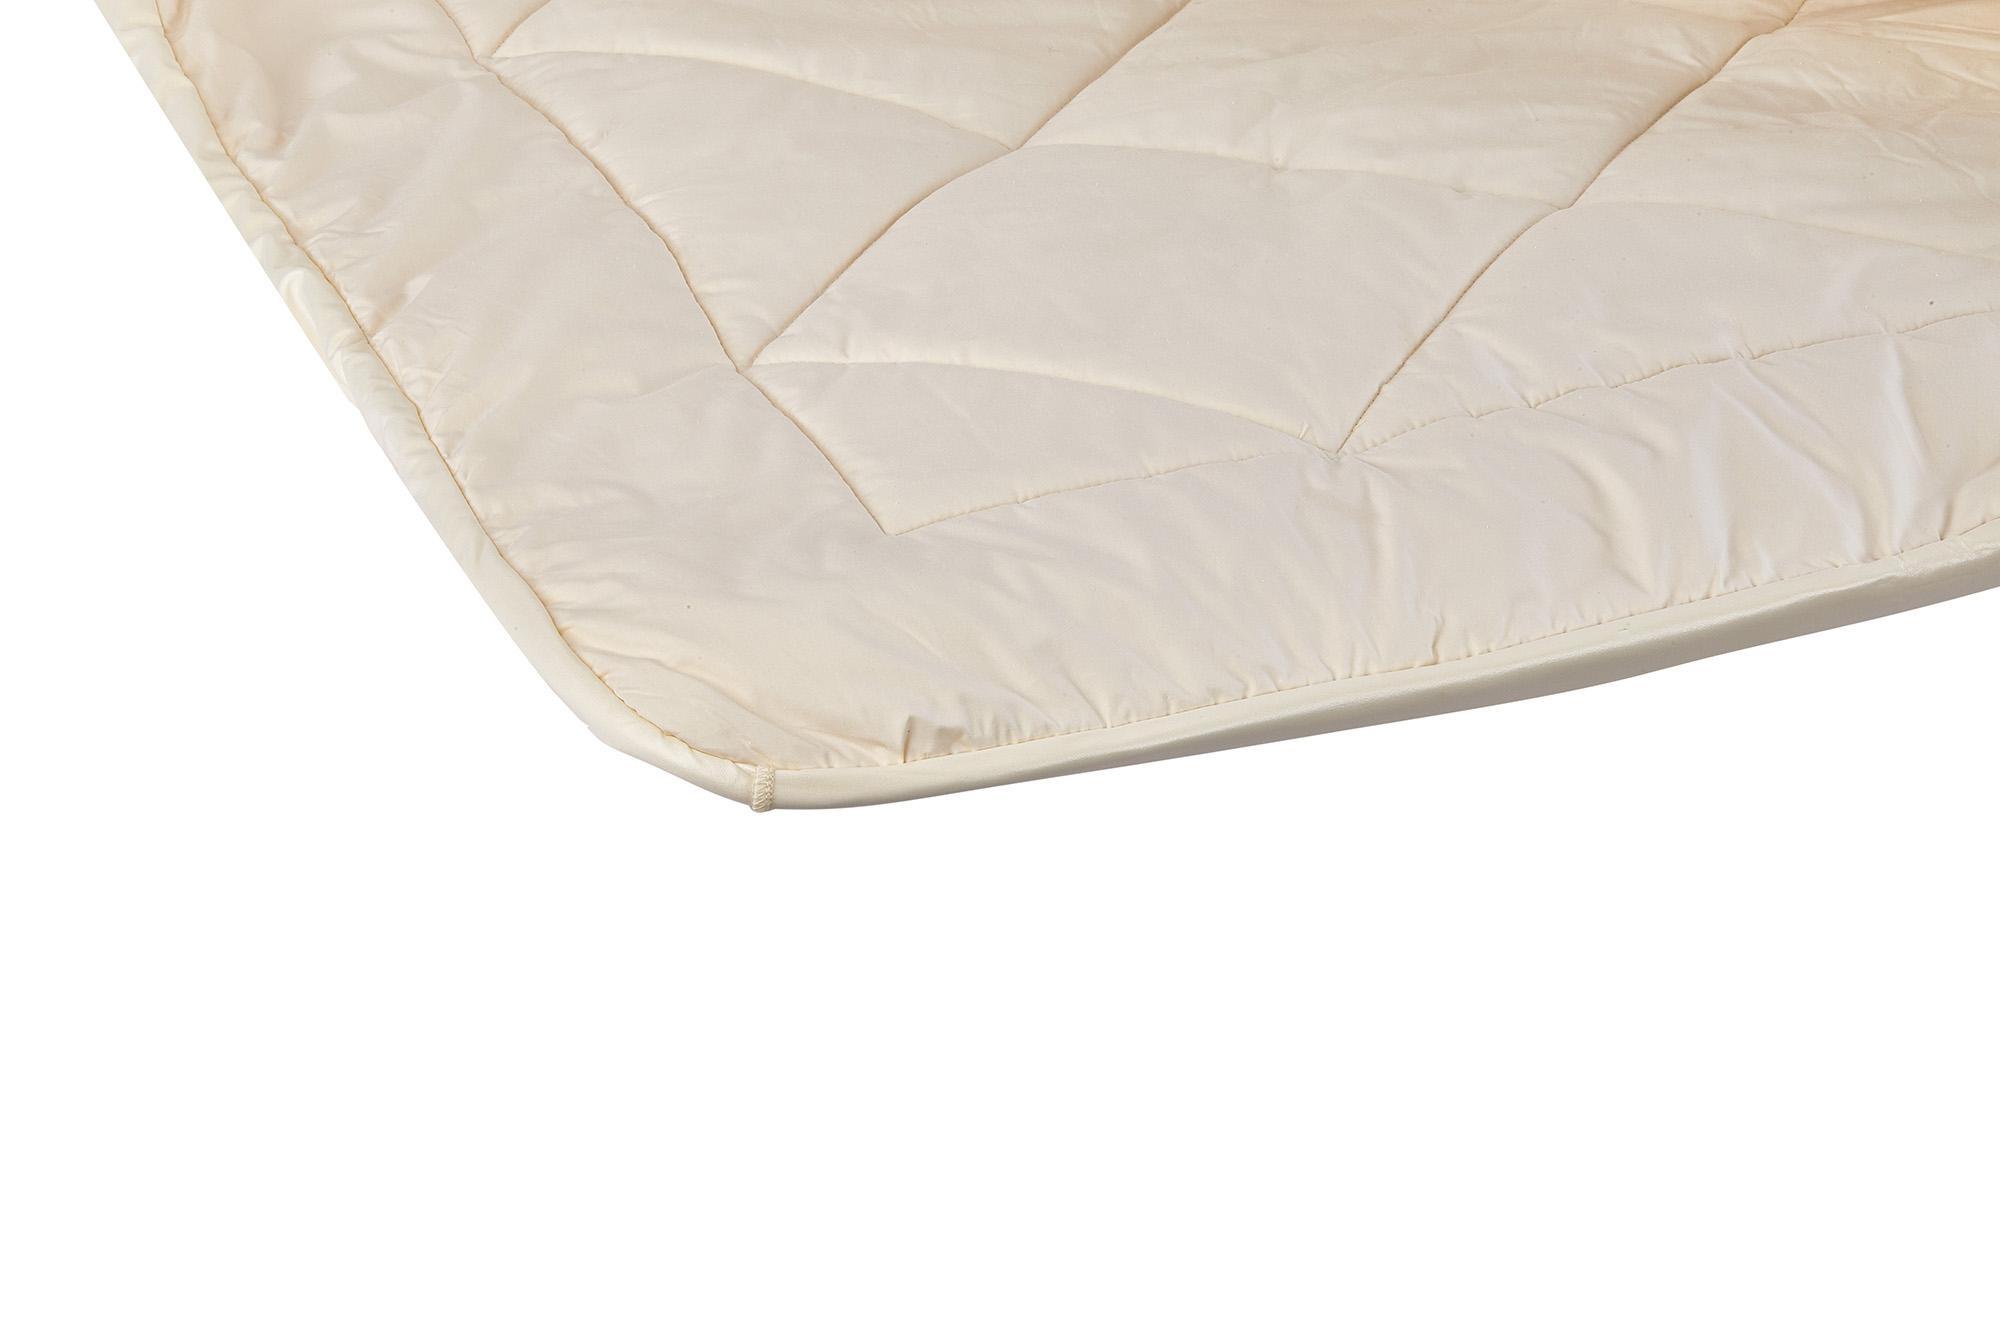 us fitted product mattress covers information natura pad usa protegematelaslaineorganic filled organic wool additional